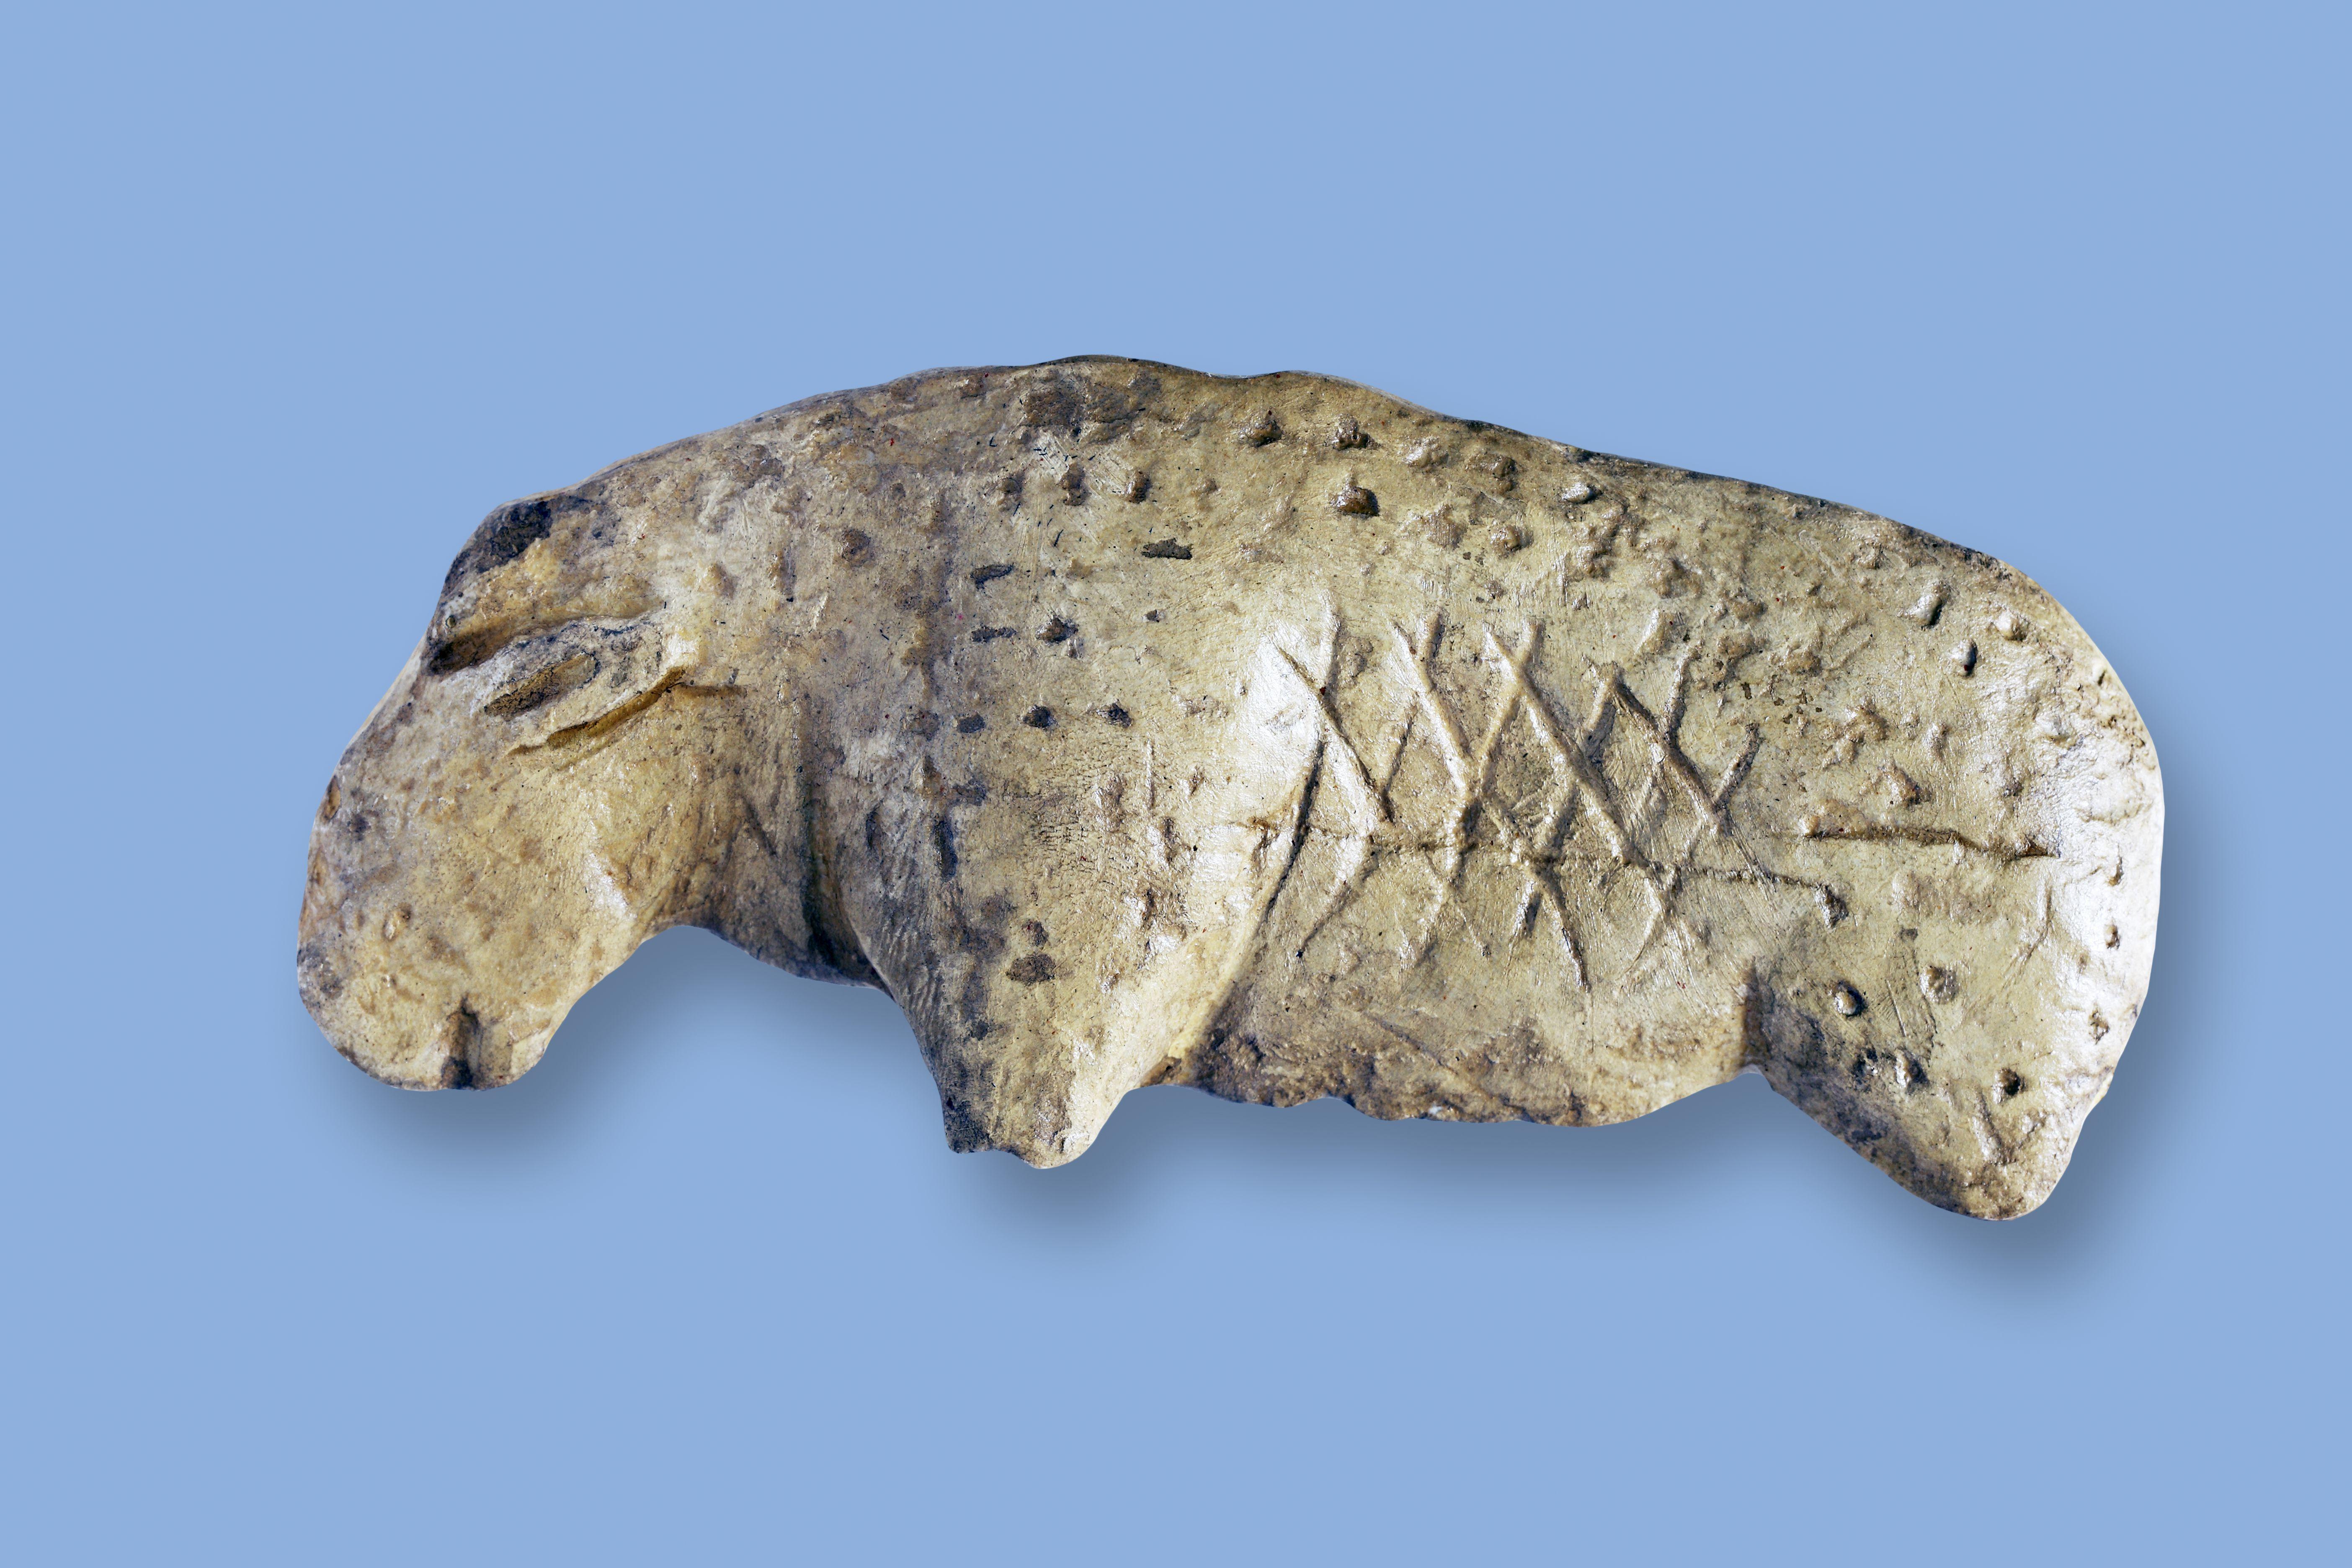 Lion Figurine from Vogelherd Cave